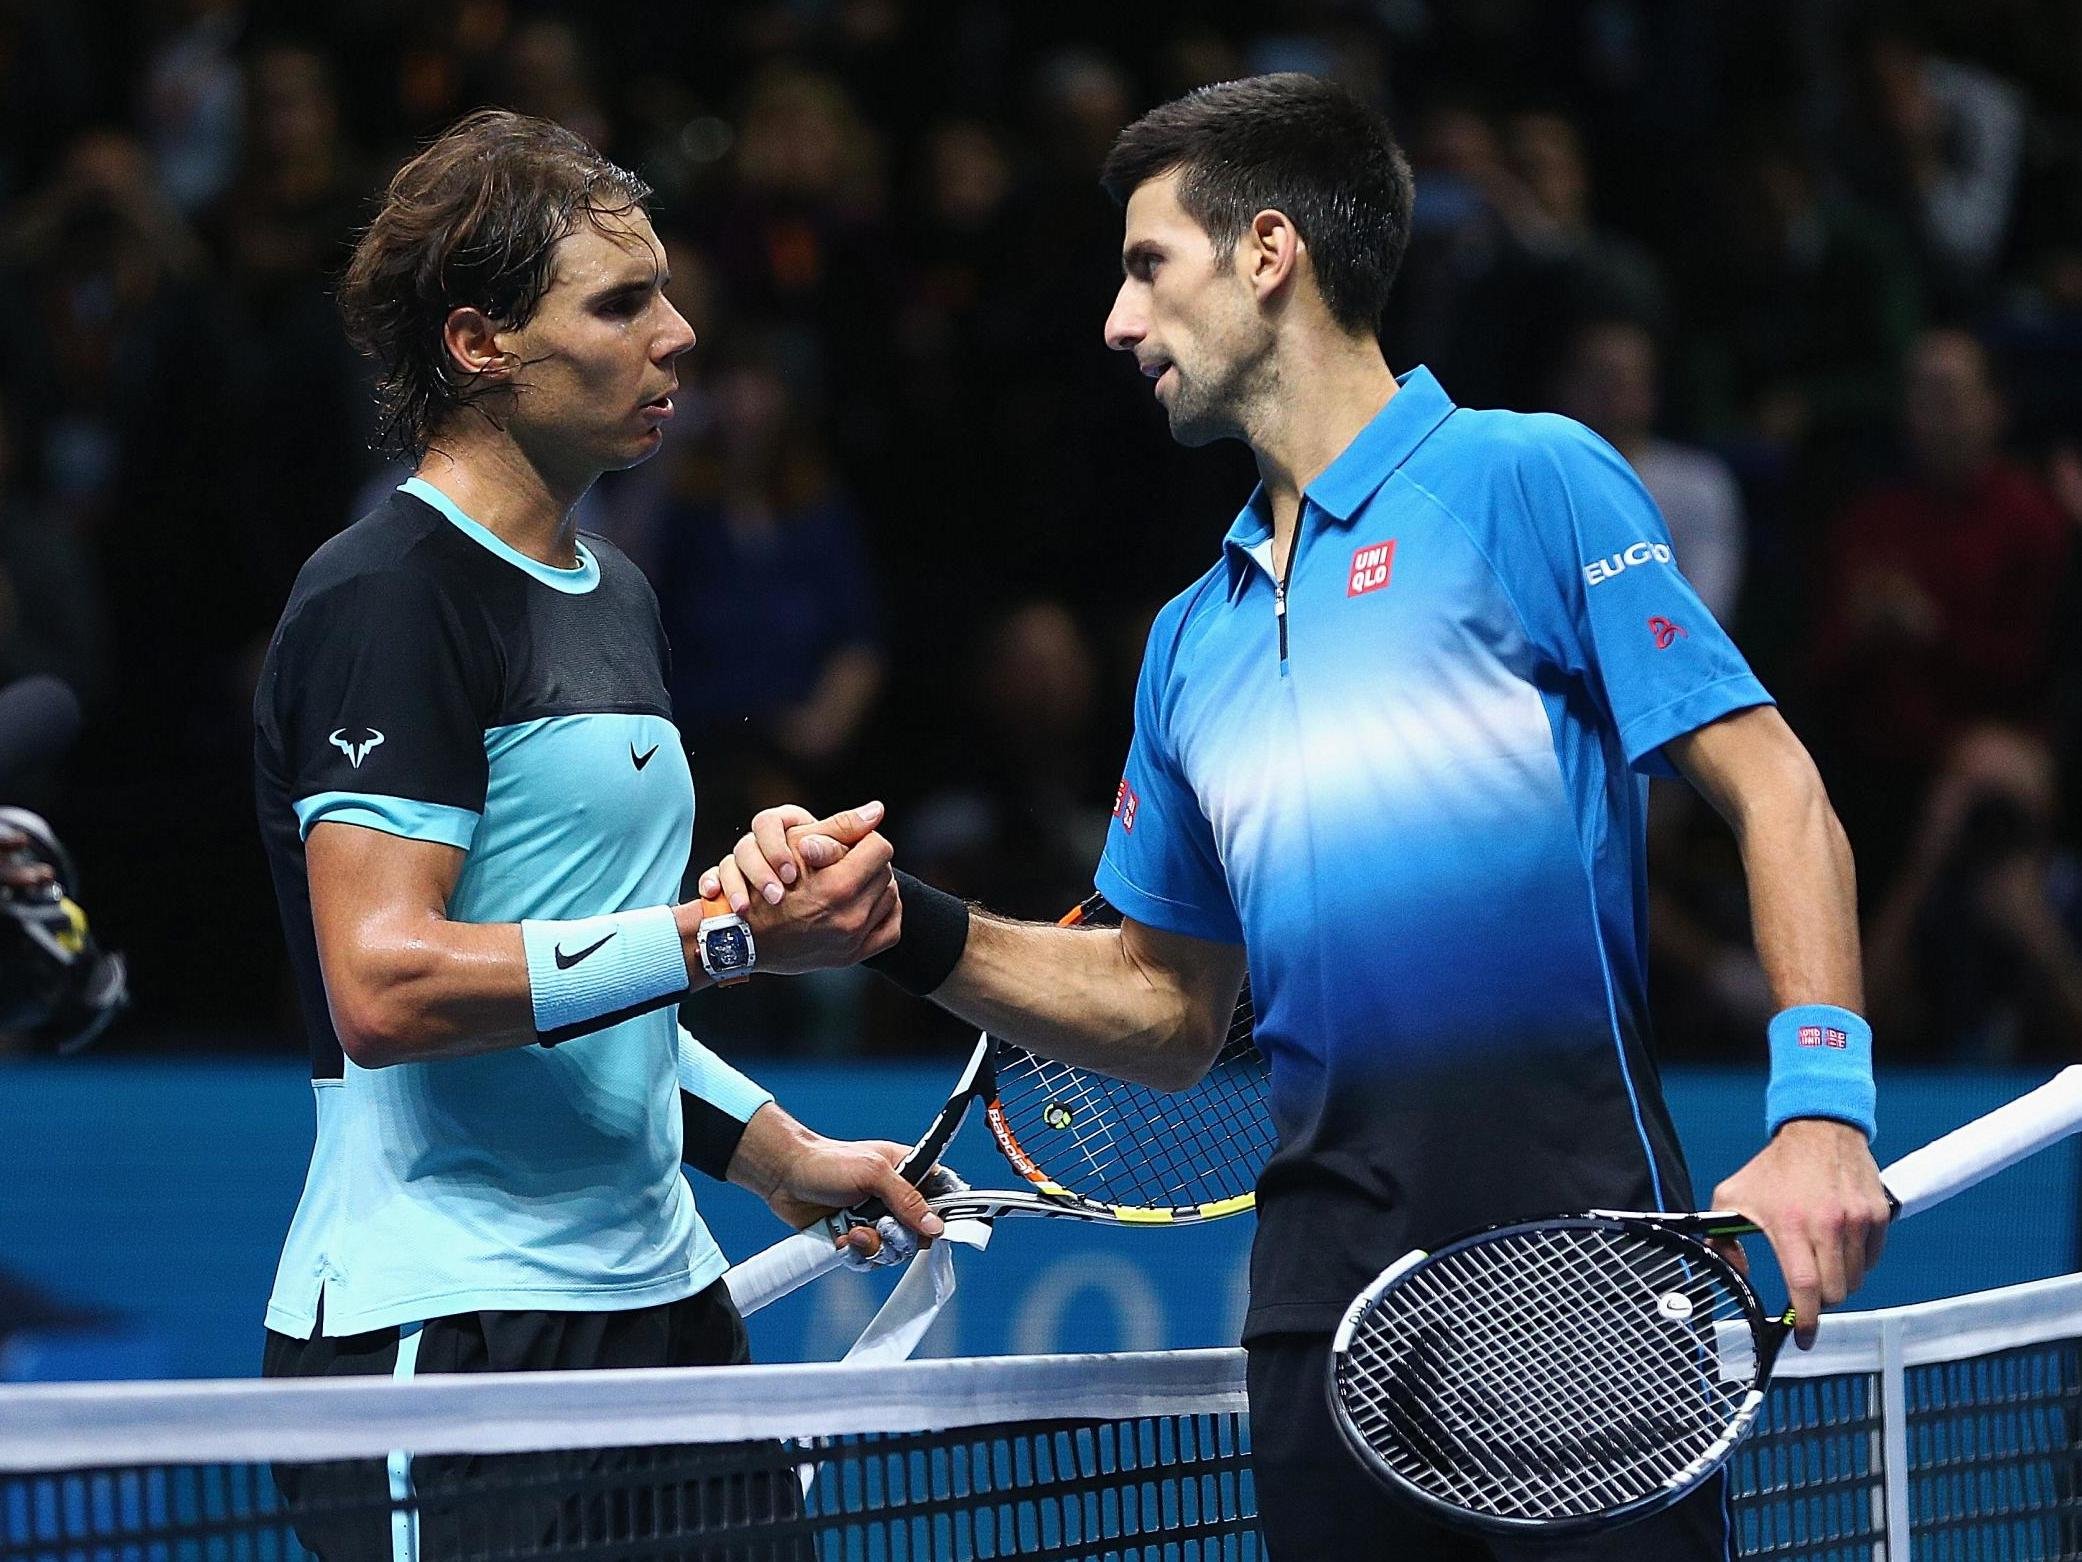 Rafael Nadal Vs Novak Djokovic Who Will Win The Experts Have Their